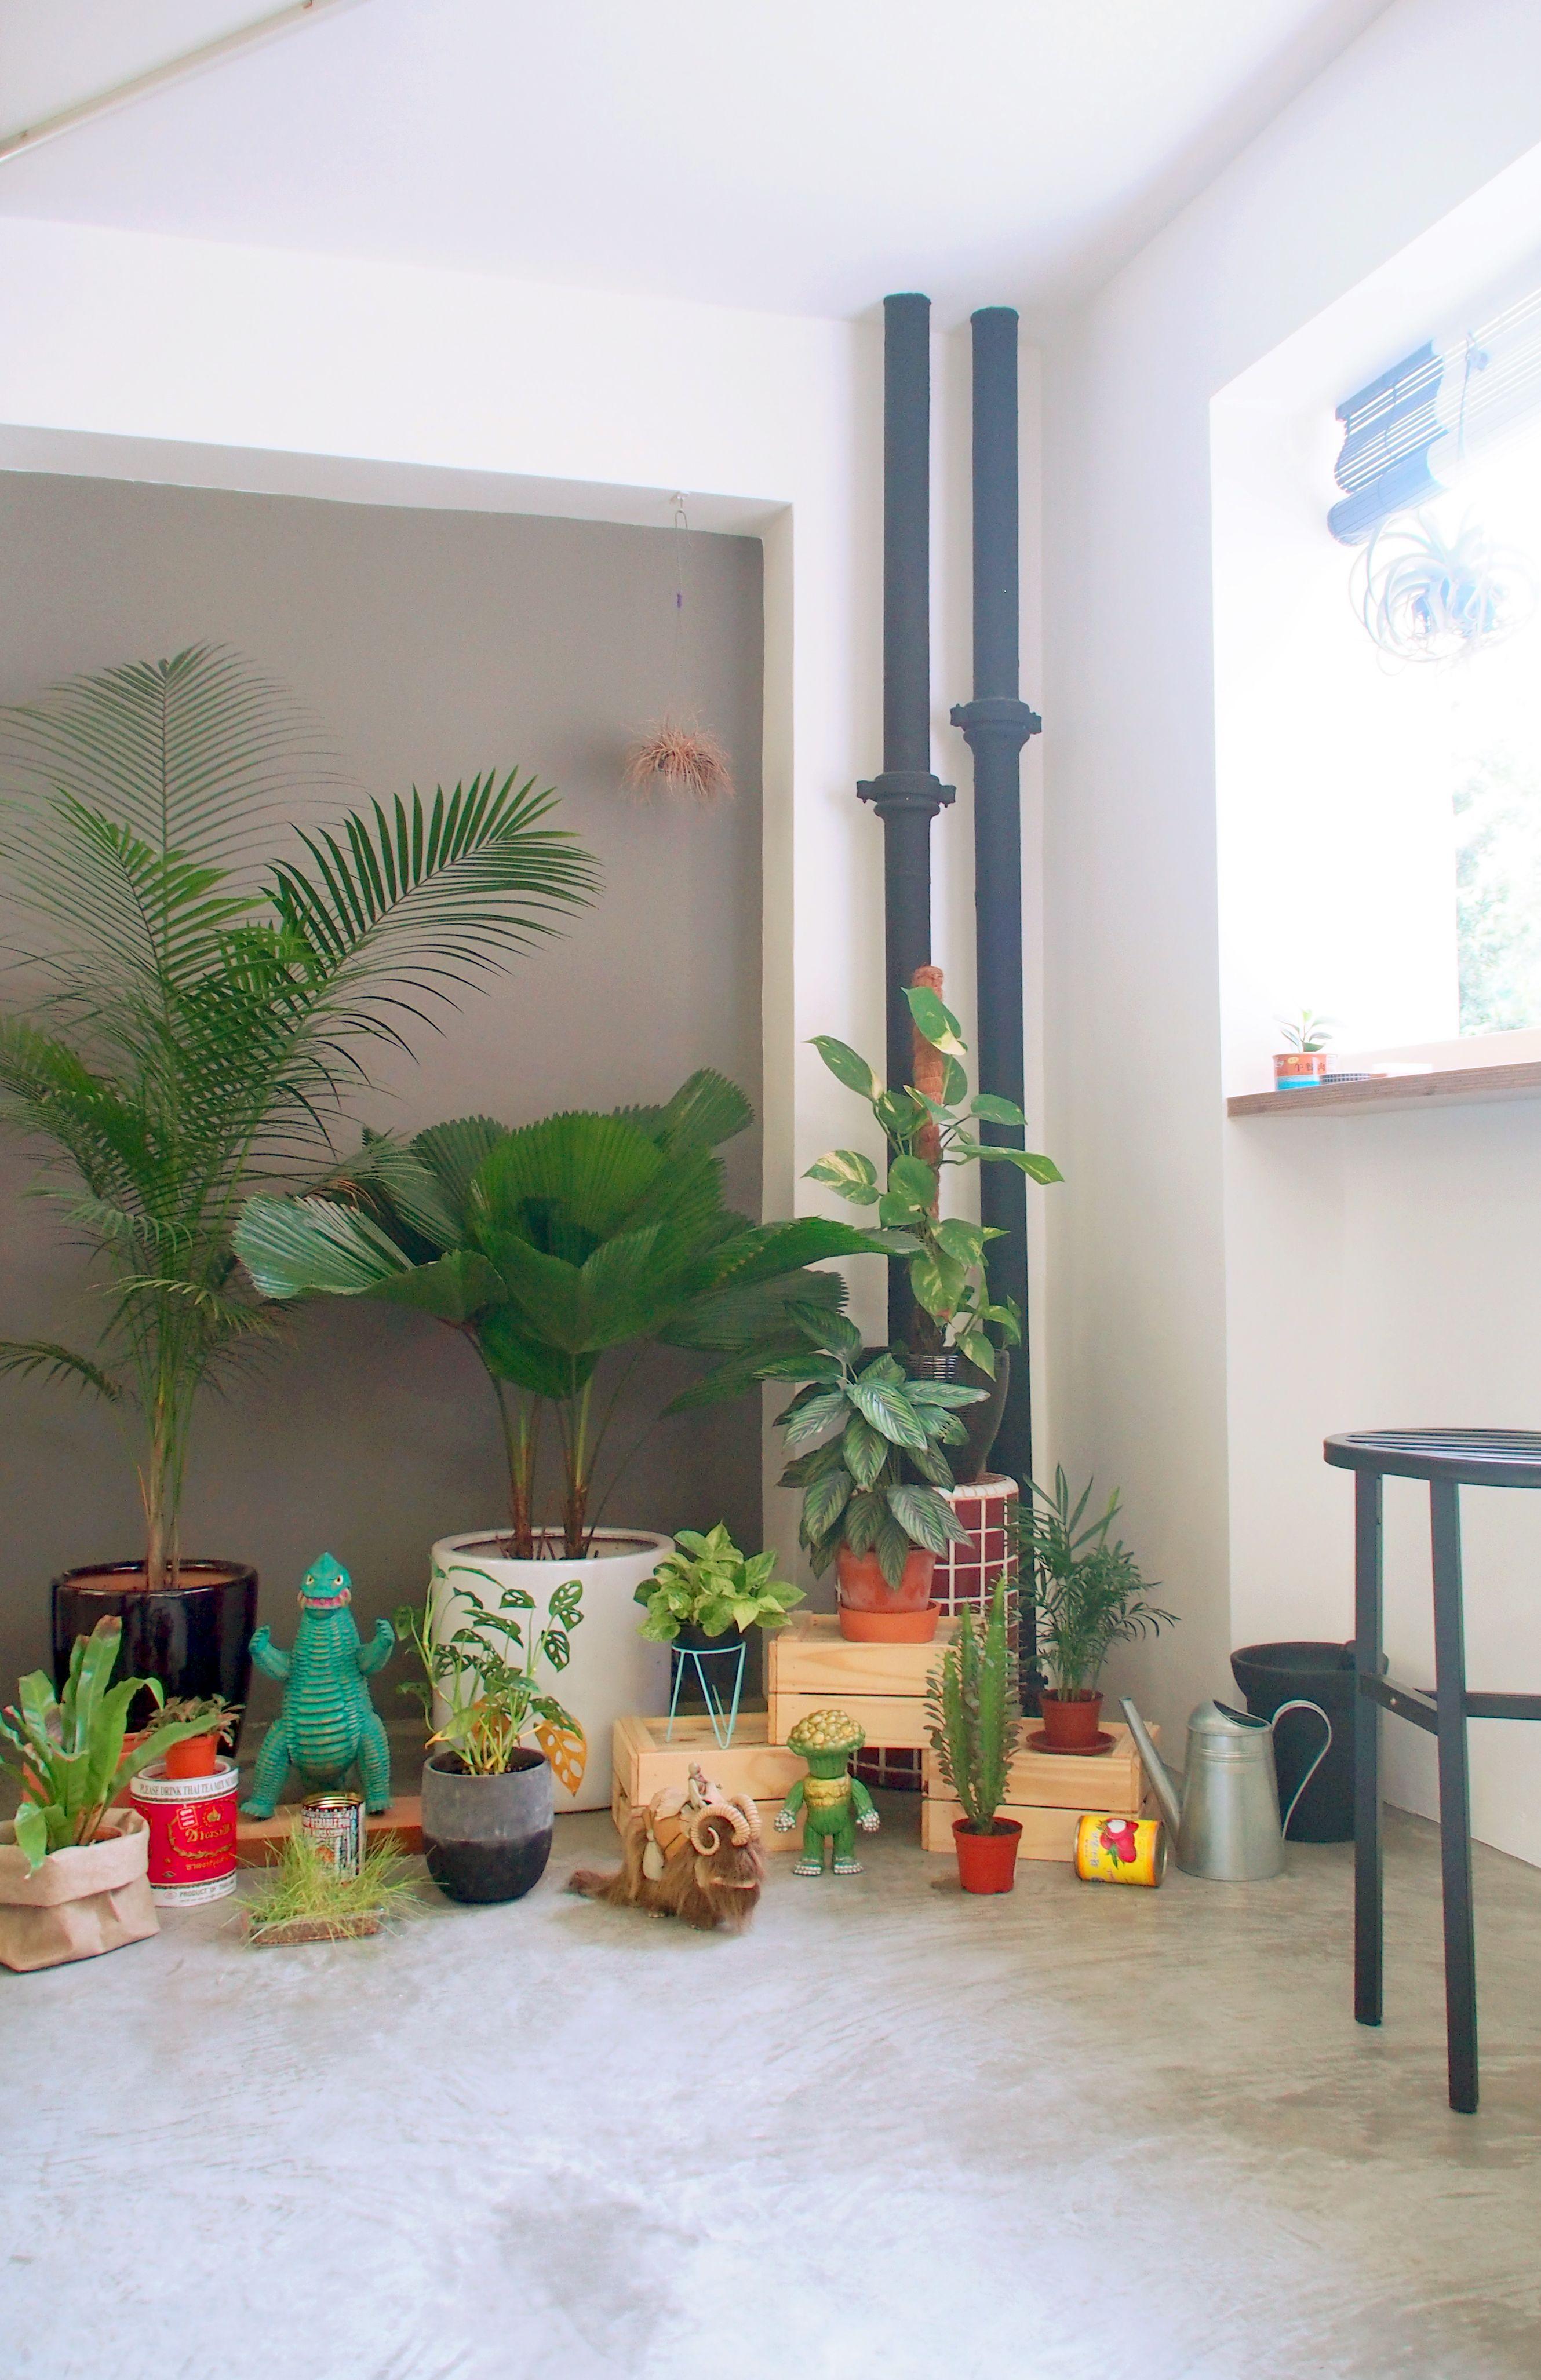 Bedroom Hdb Furniture: HDB Balcony - Interior By The Association